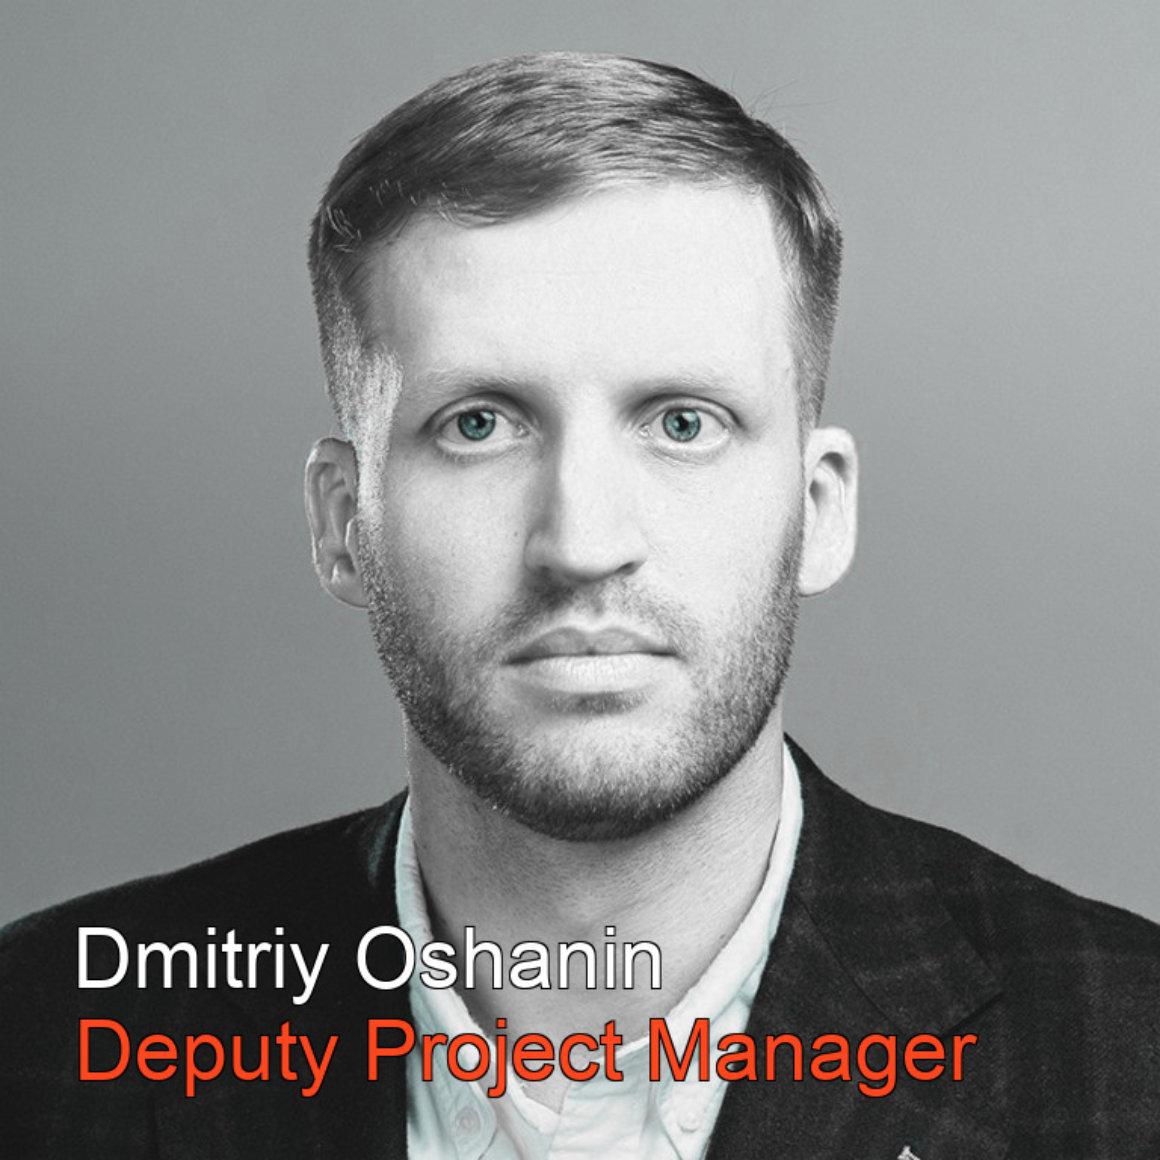 Dmitry Oshanin DPM BW